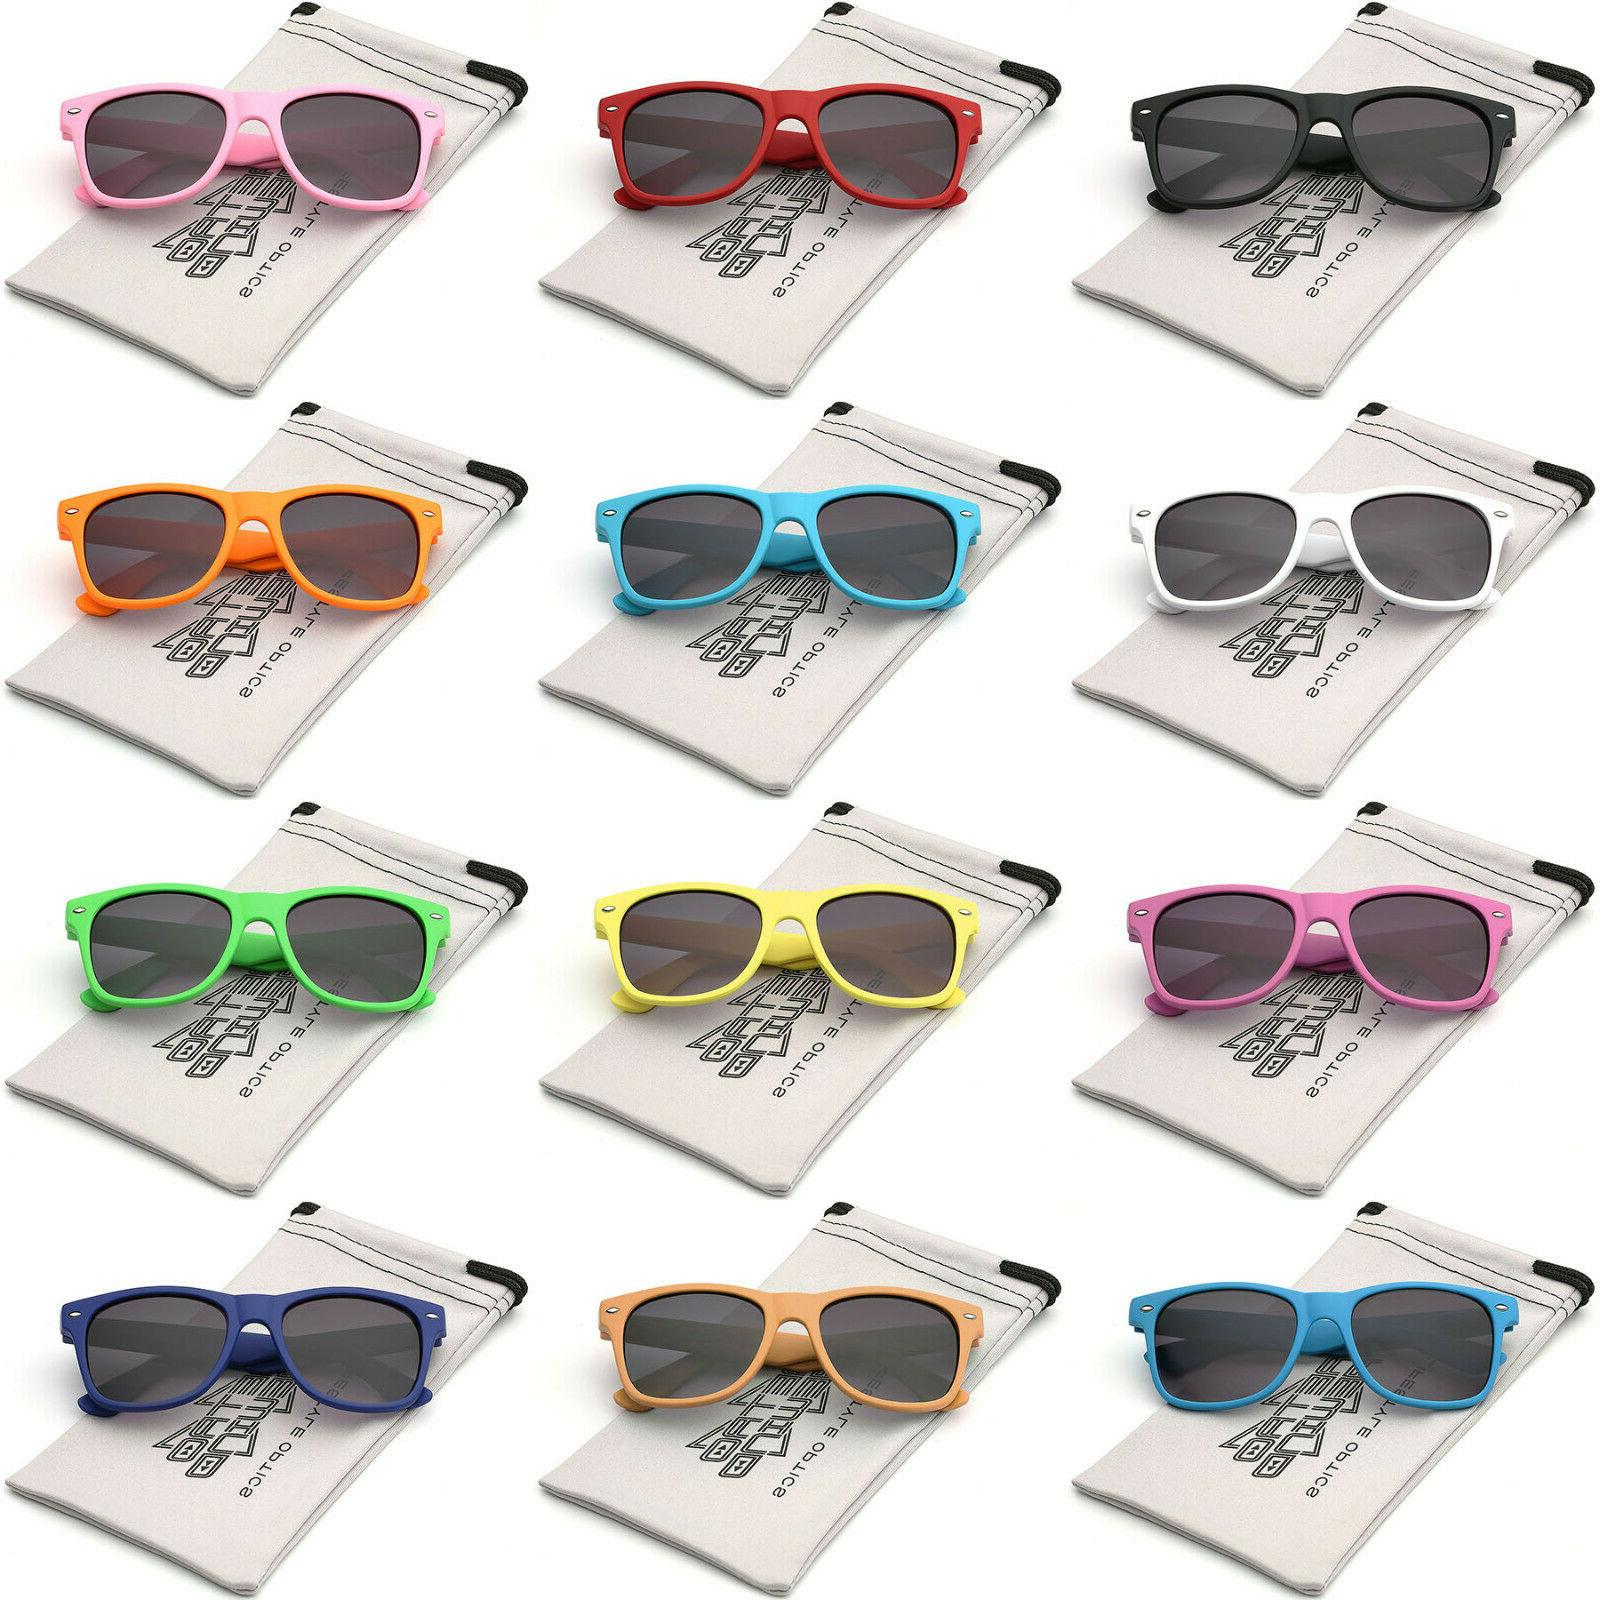 Kids Retro Sunglasses Boys Girls Toddler Preschool Grade Sch